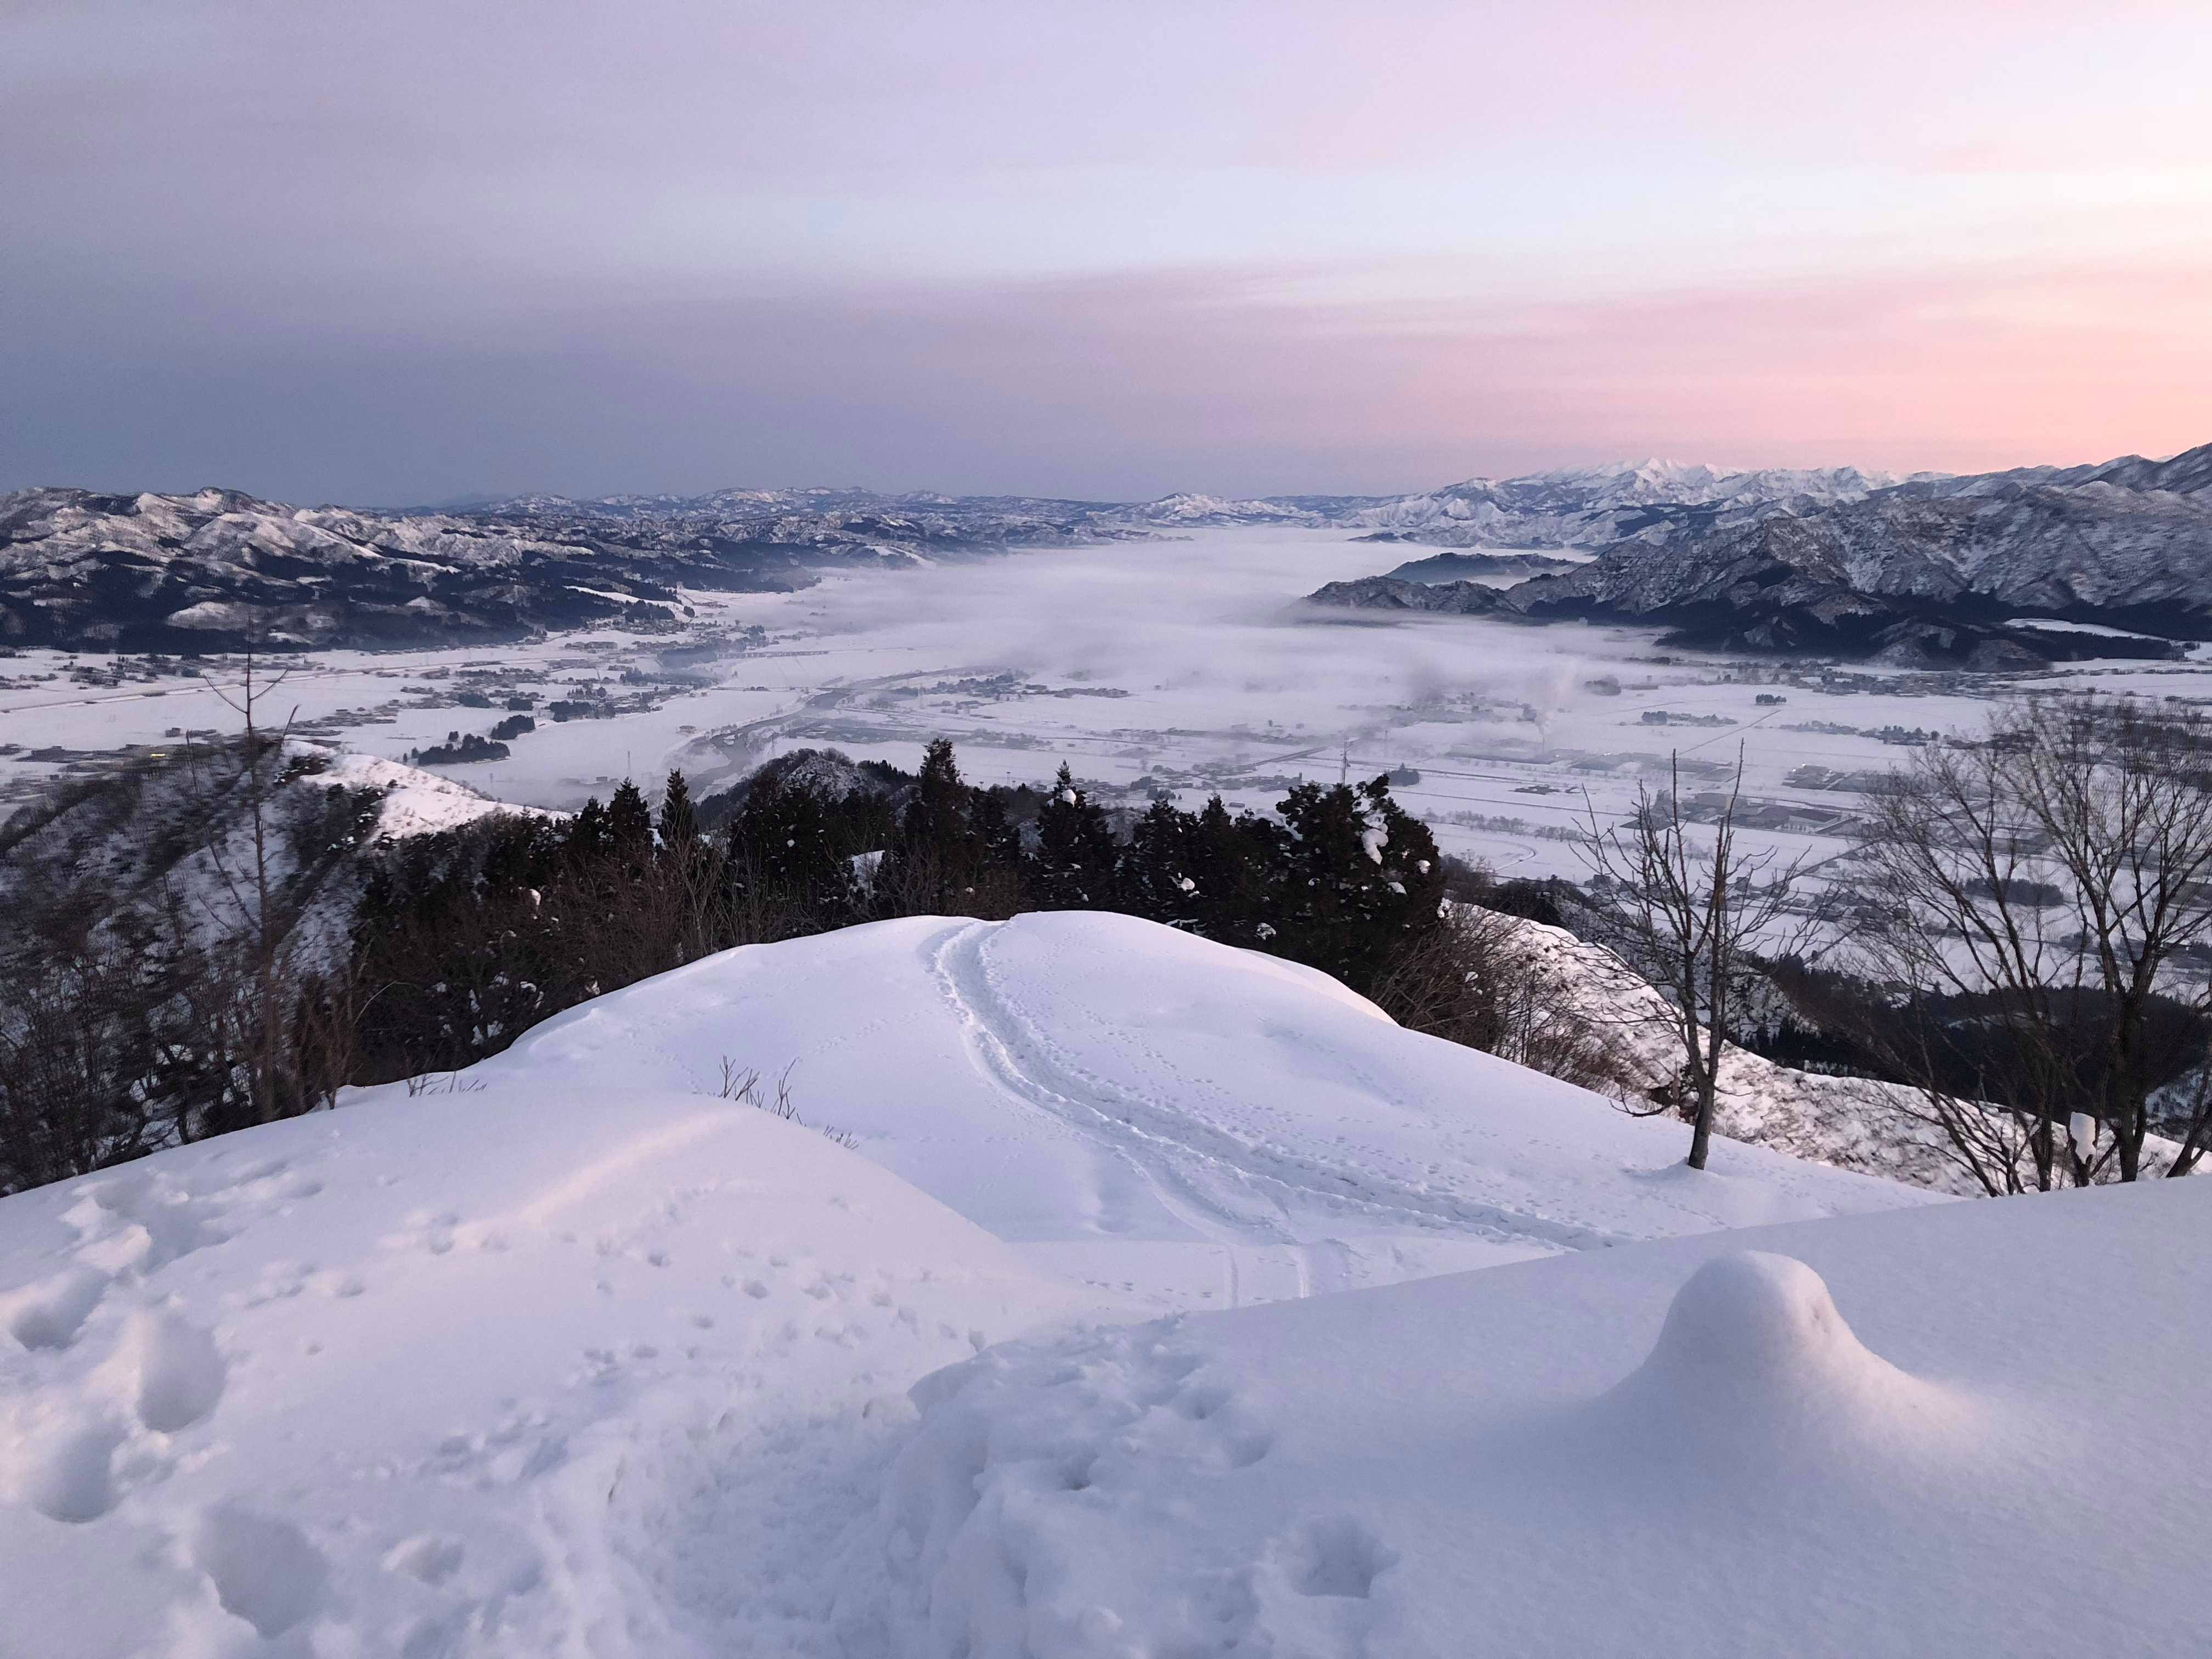 2019.1.15 tue.雪の坂戸山雲海 BY HUNTER-KYUN